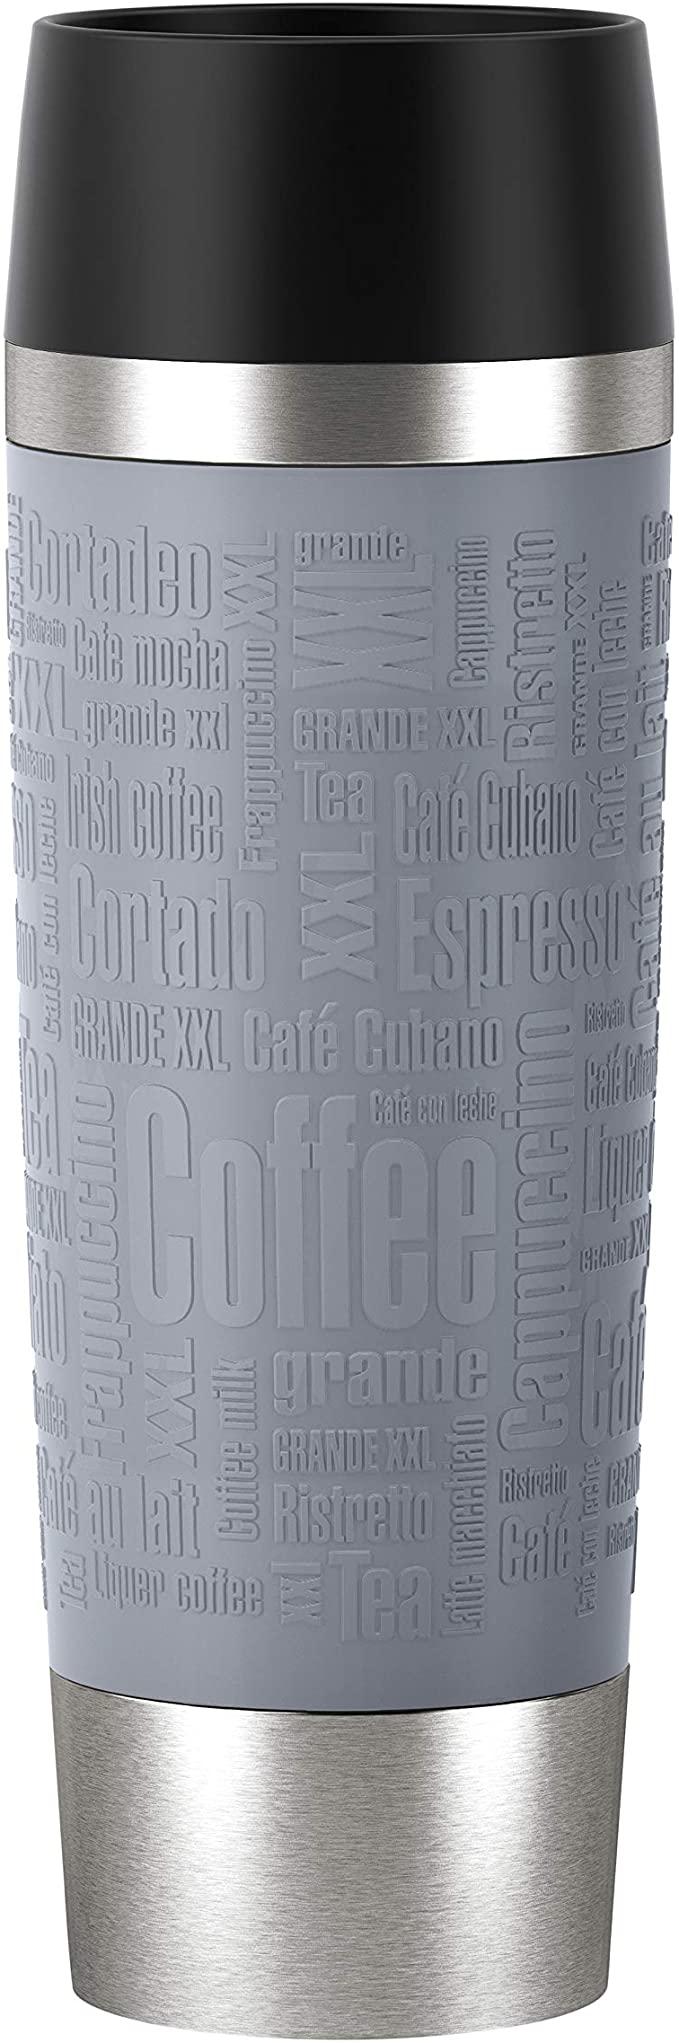 Emsa N2013100 Travel Mug Thermo-/Isolierbecher aus Edelstahl